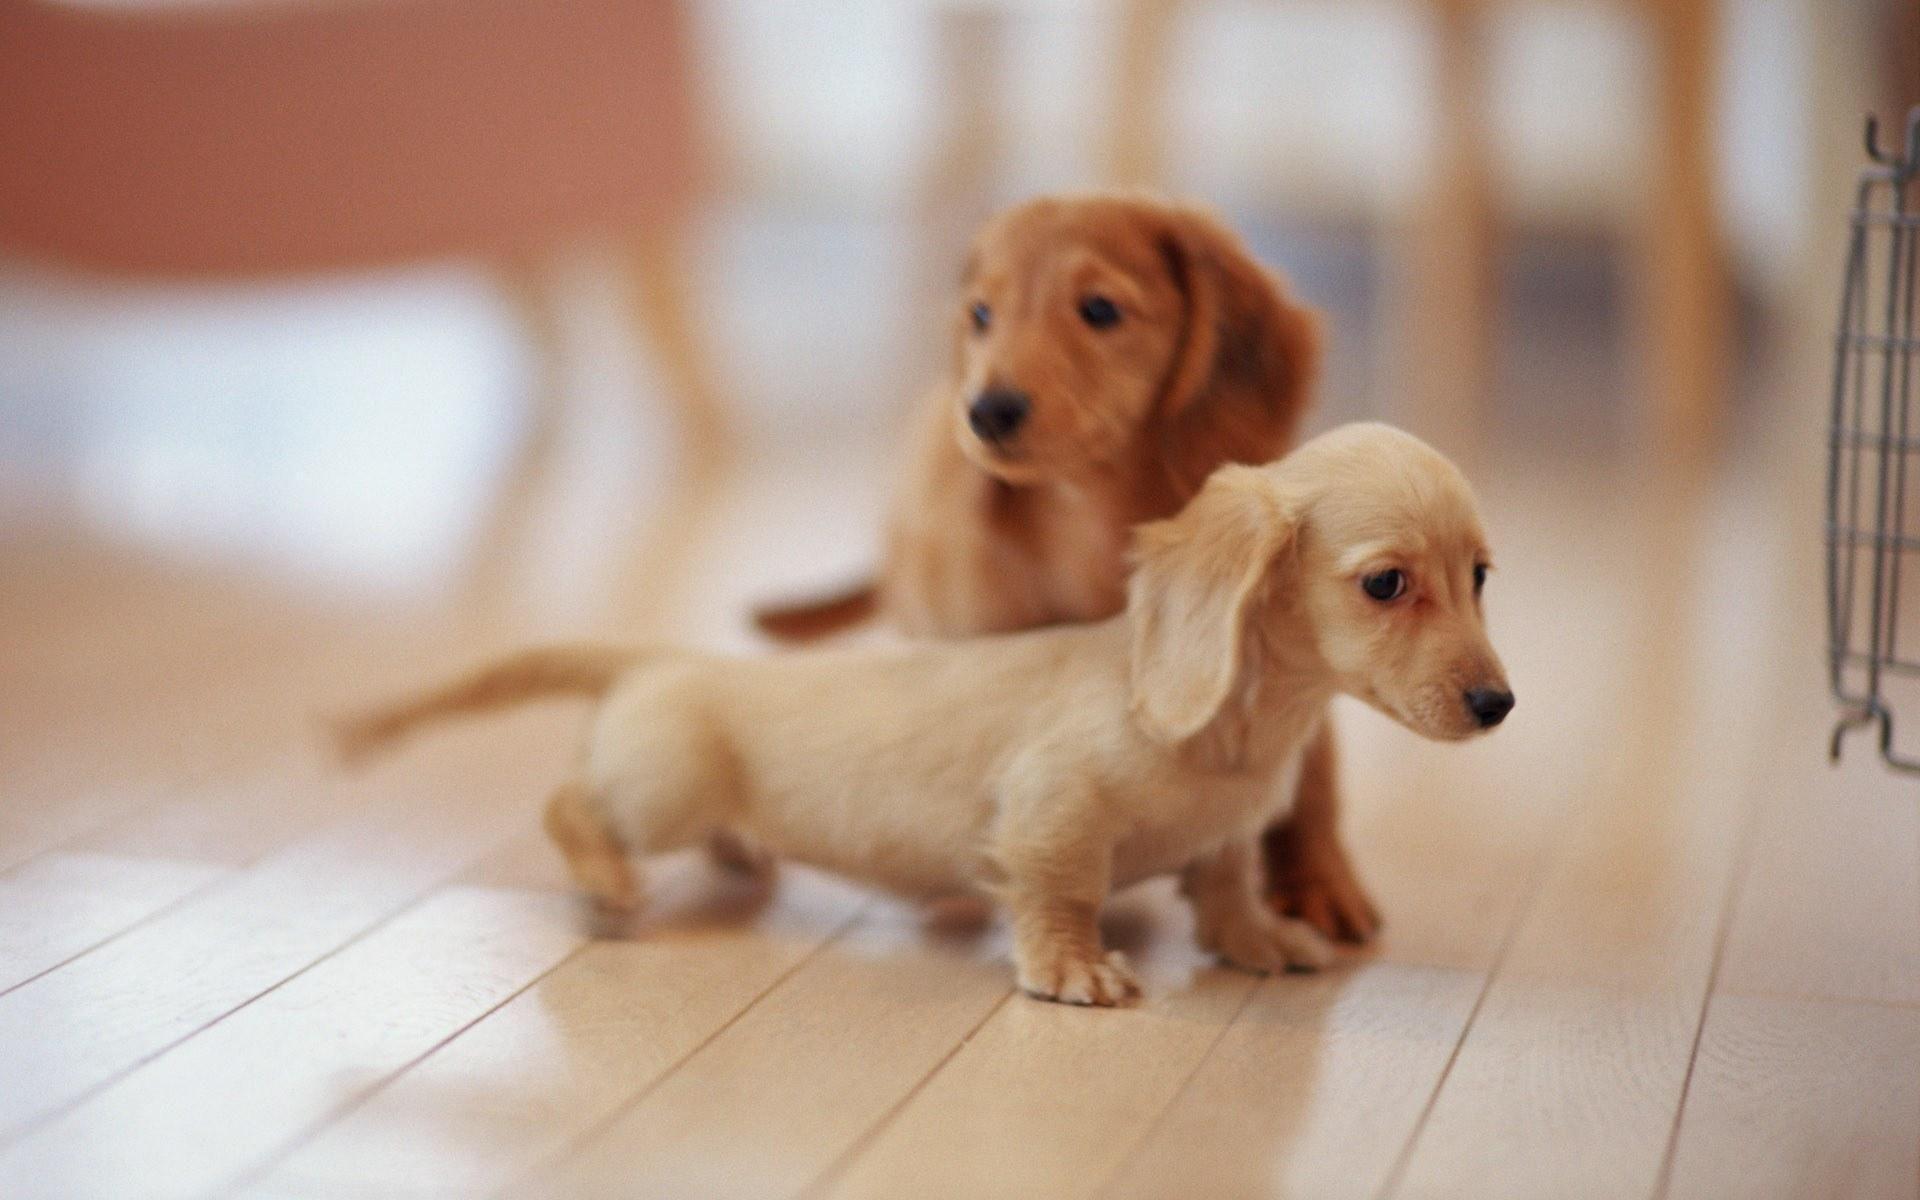 Lovely Dog Wallpaper Dachshund Puppy Miniature Dachshund